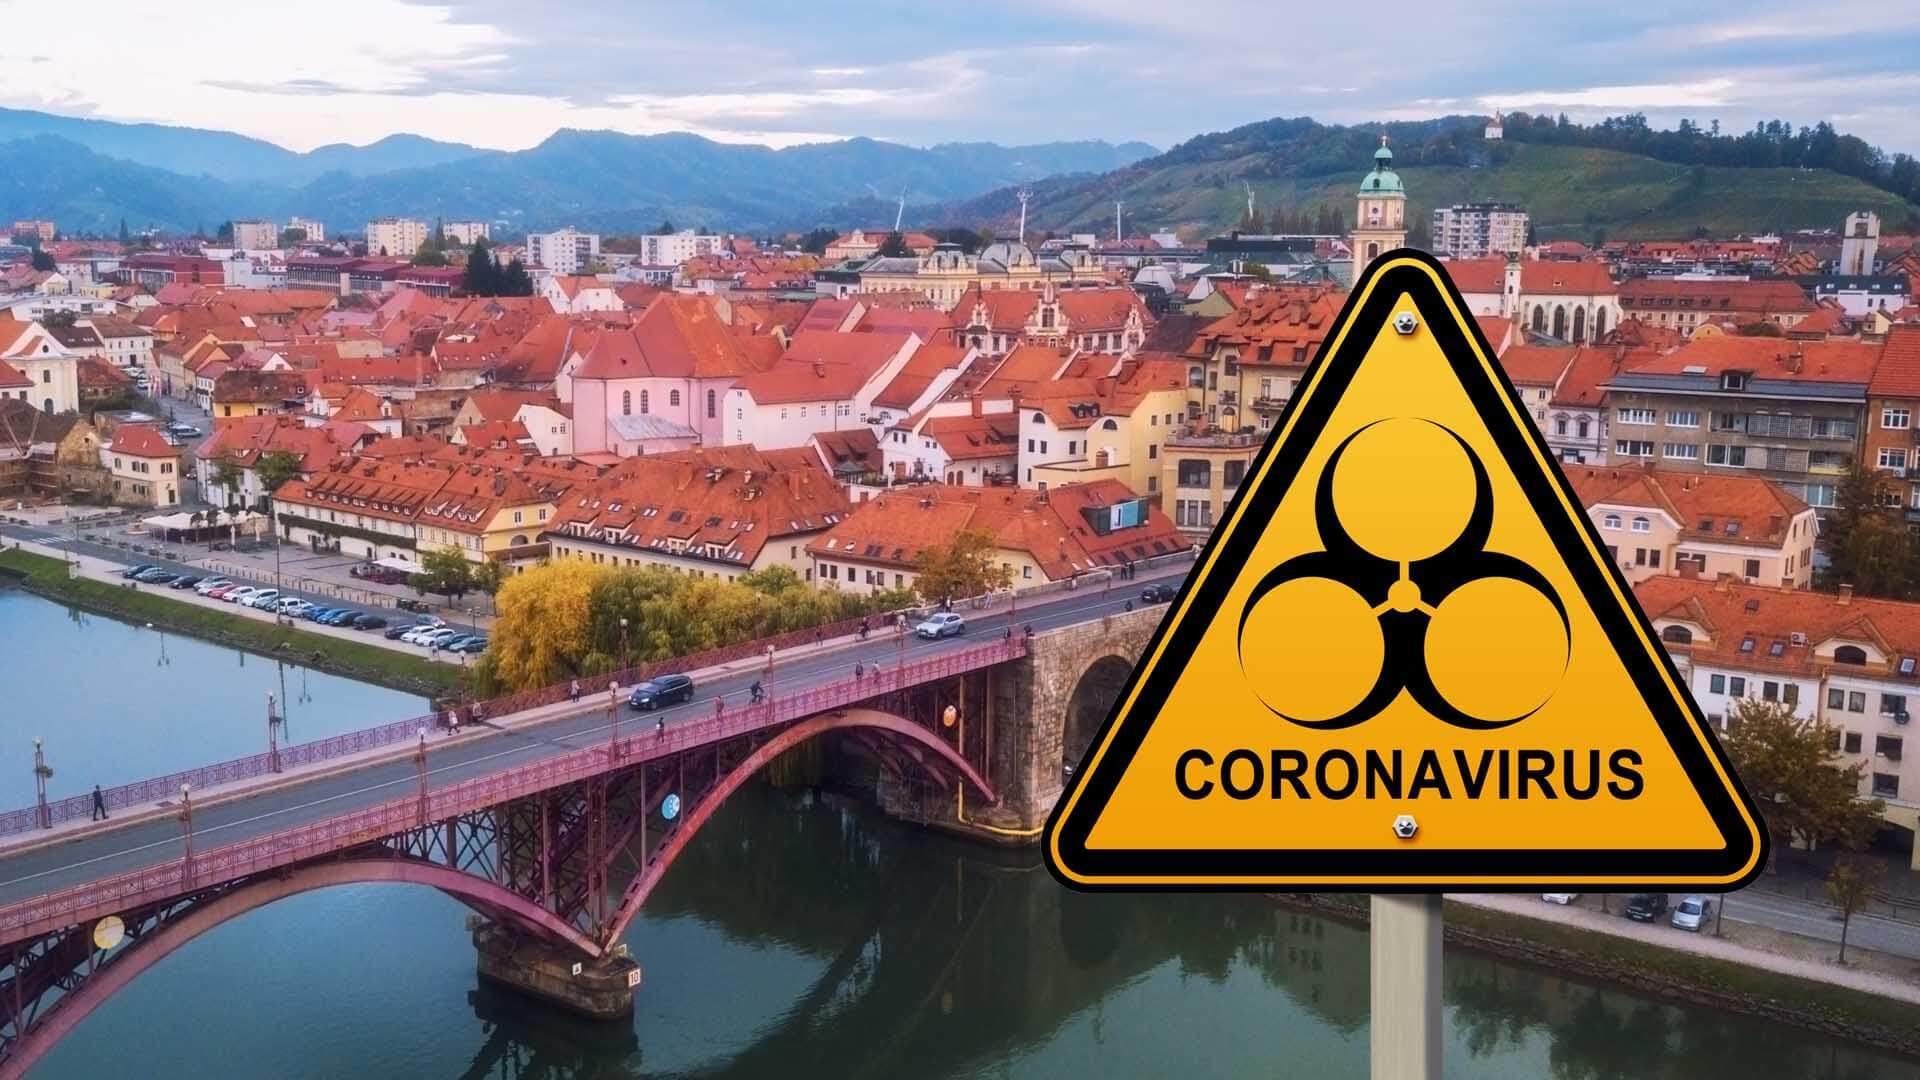 Virus se hitro širi. Šesti okuženi iz okolice Maribora